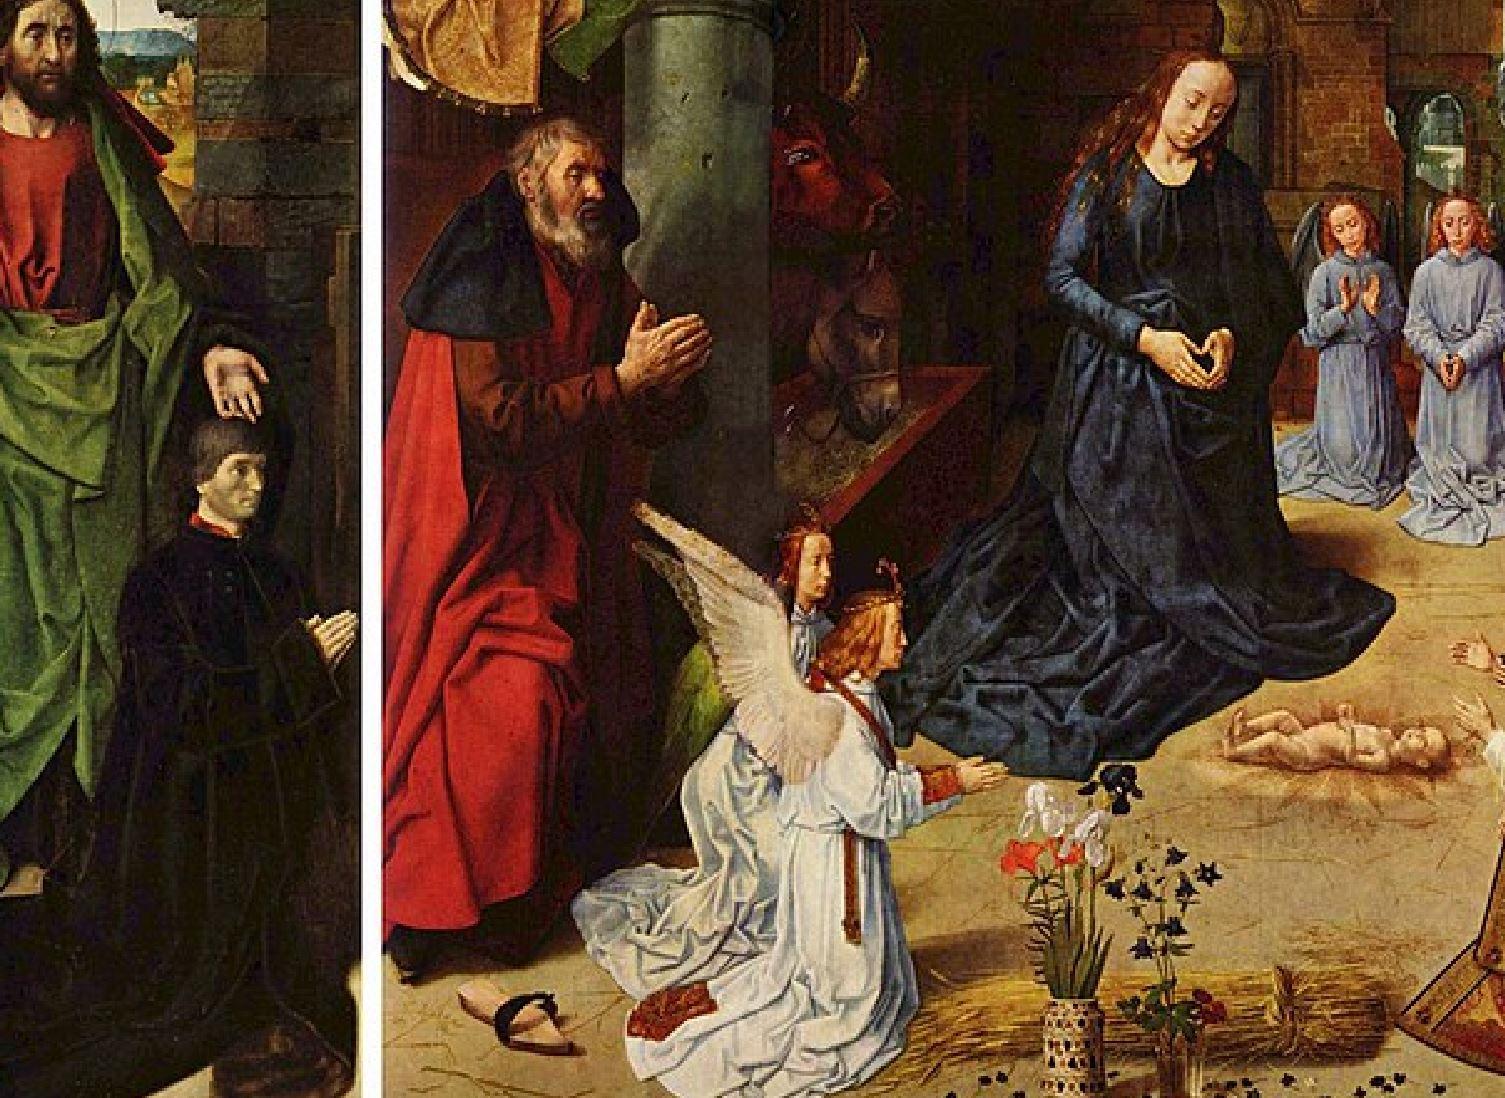 1475 Hugo_van_der_Goes Triptyque Portinari Offices Florence detail